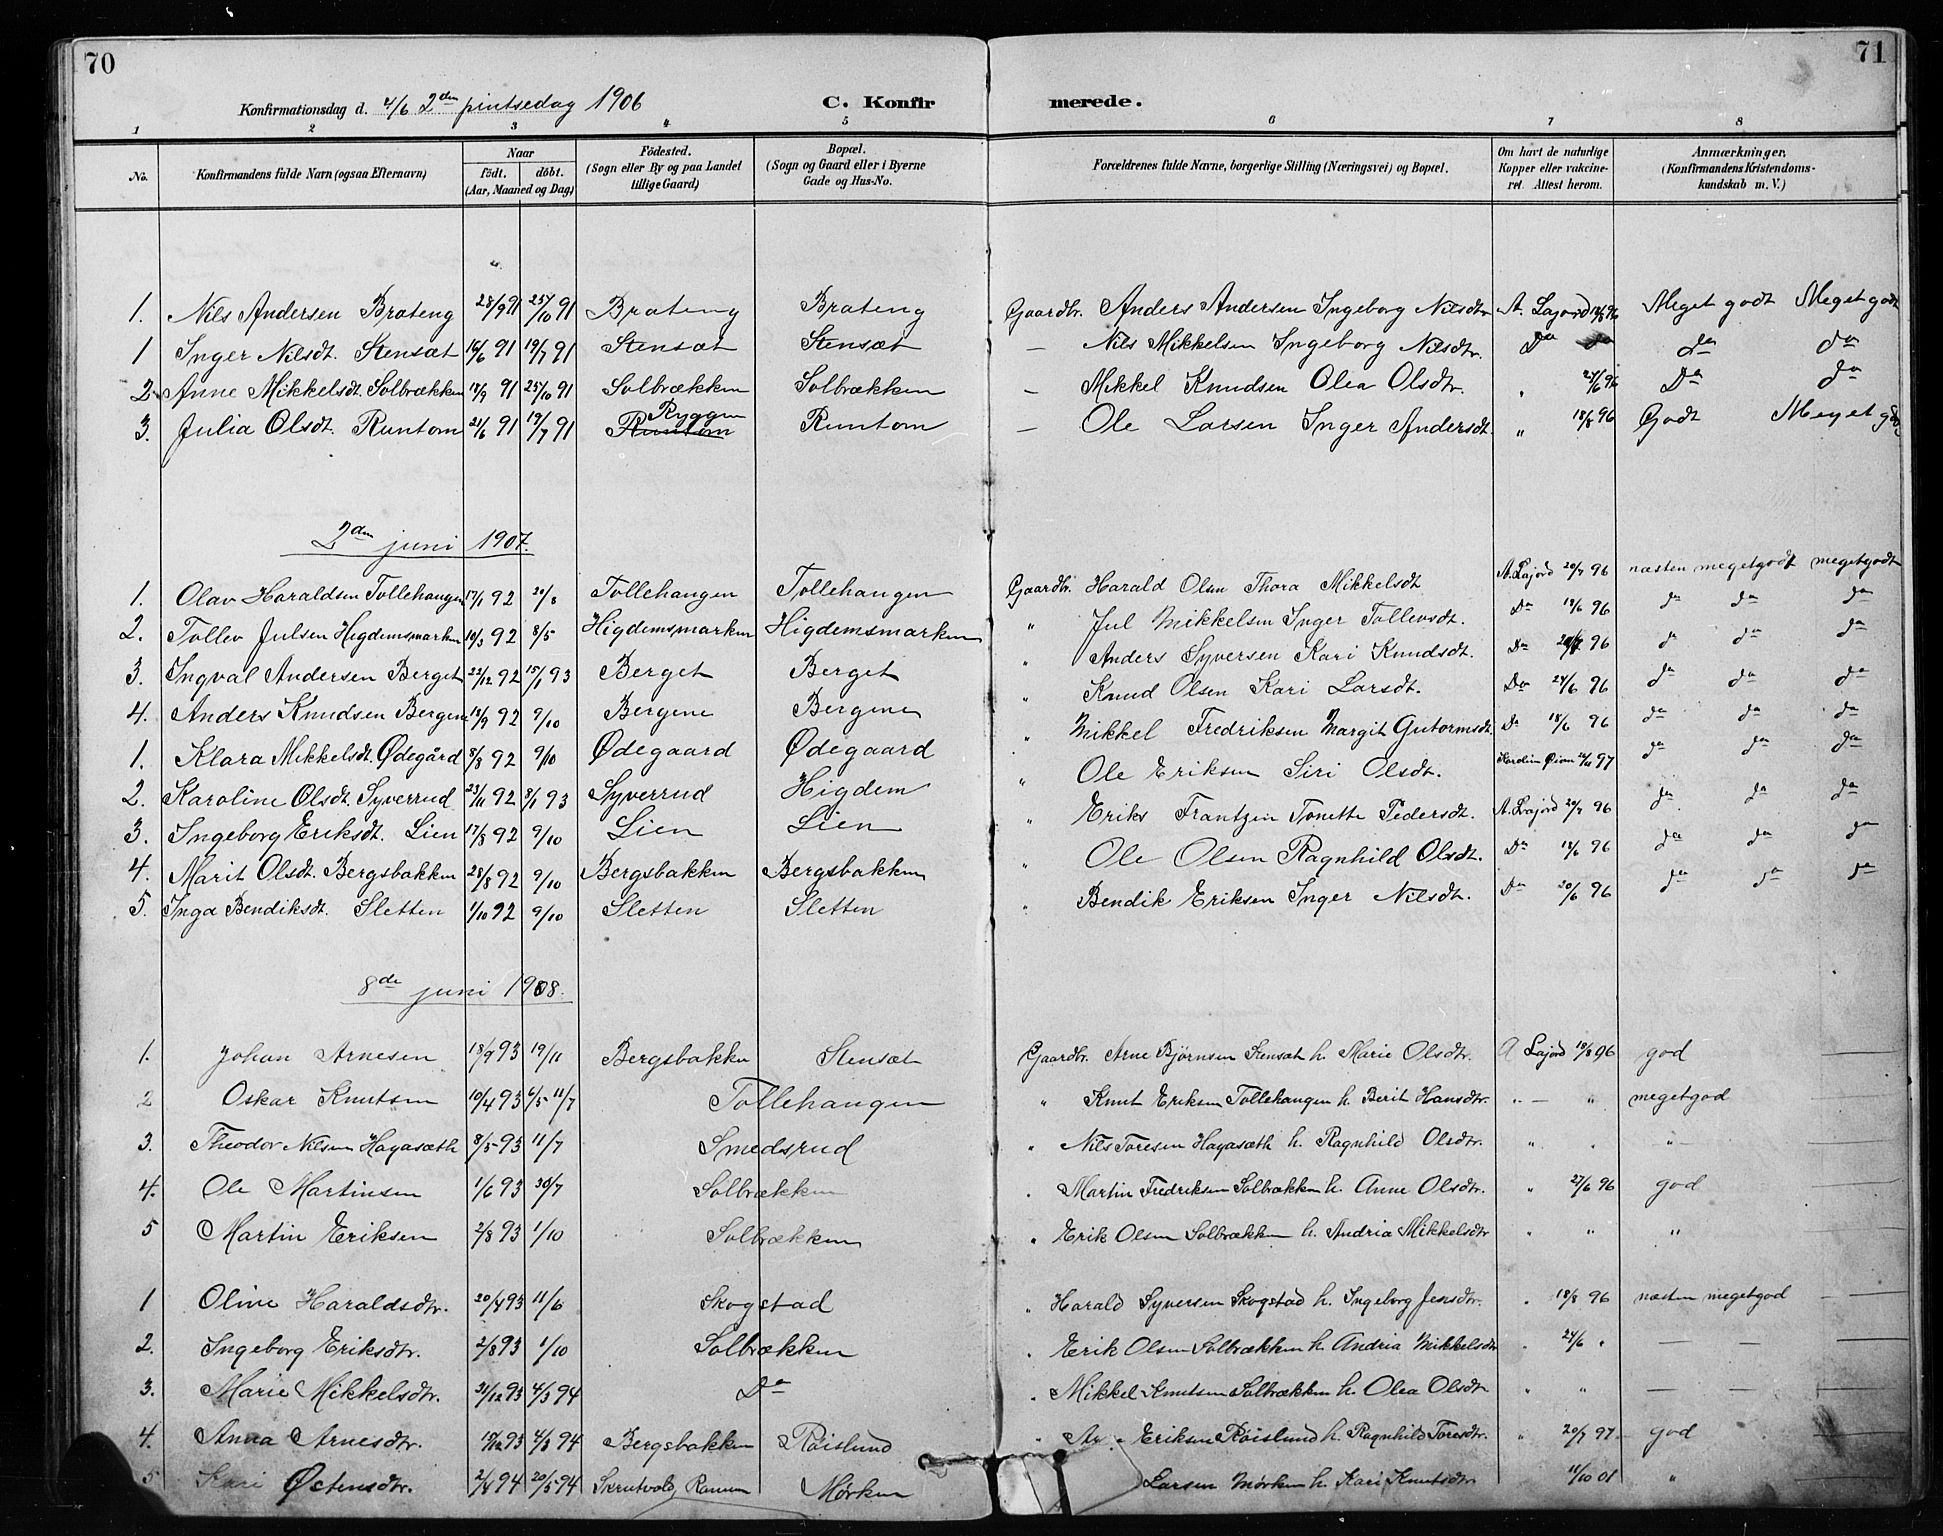 SAH, Etnedal prestekontor, H/Ha/Hab/Habb/L0001: Klokkerbok nr. II 1, 1894-1911, s. 70-71